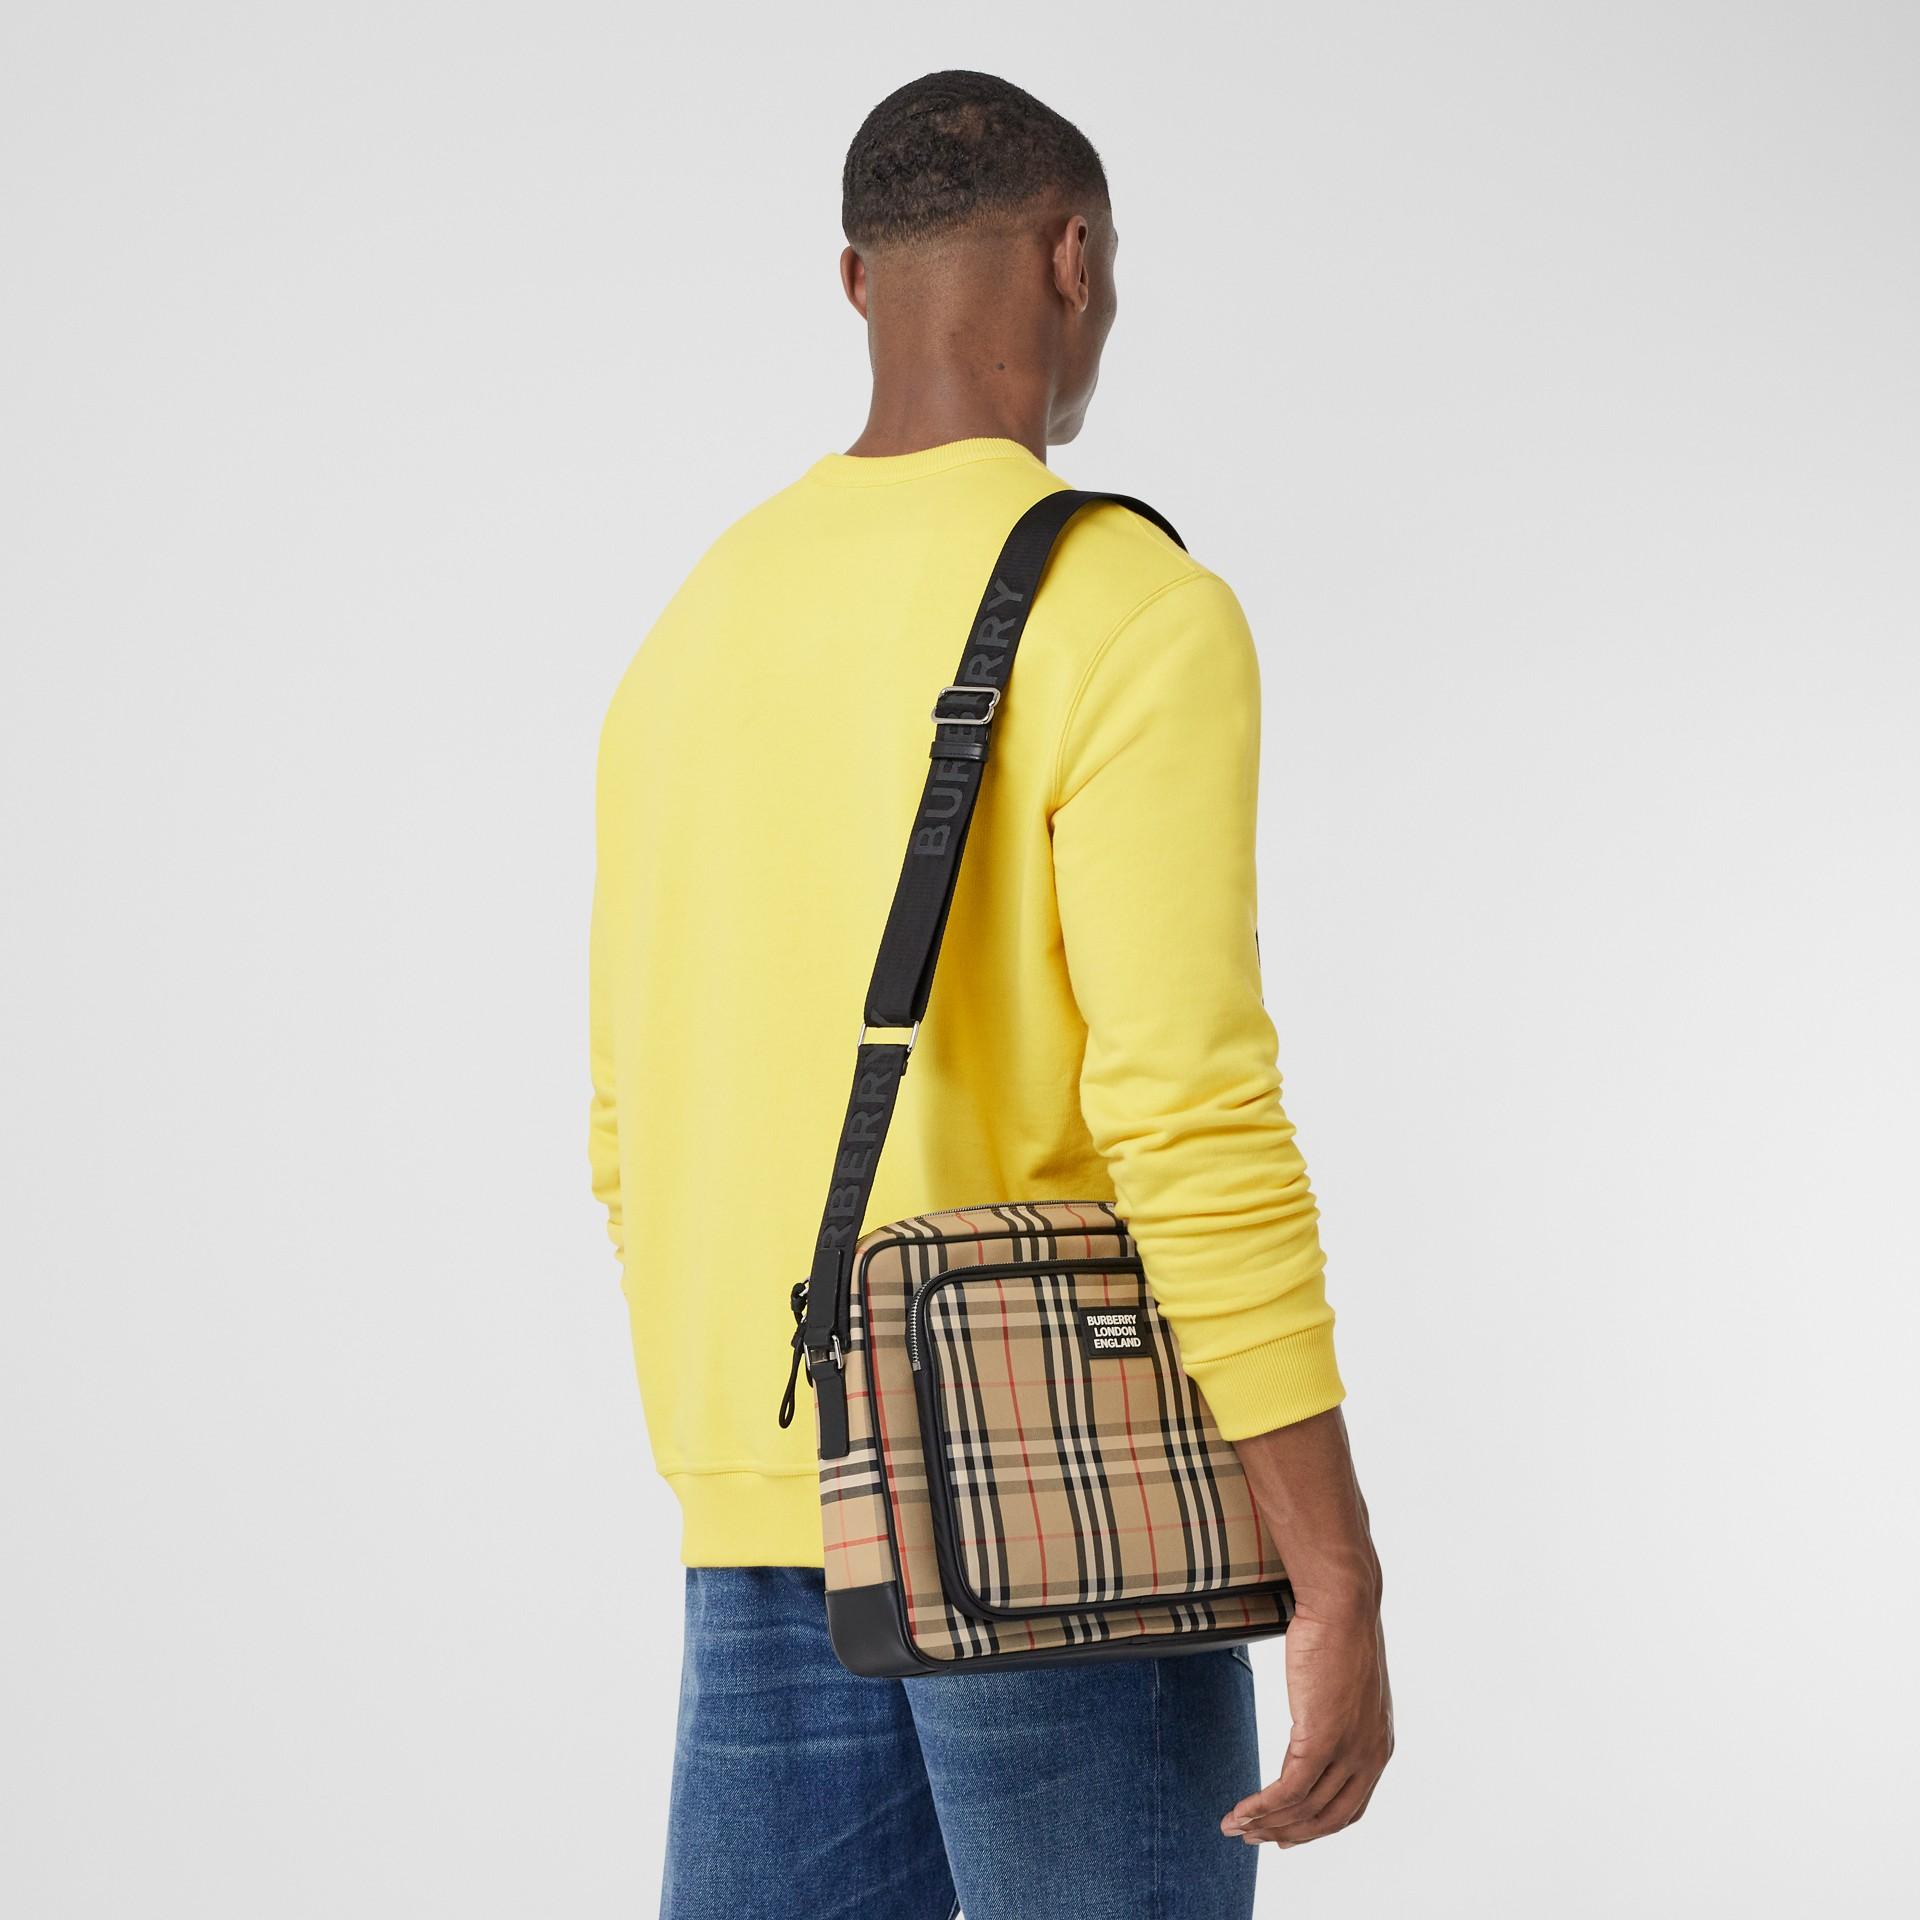 Vintage Check Cotton Messenger Bag in Archive Beige - Men | Burberry - gallery image 2